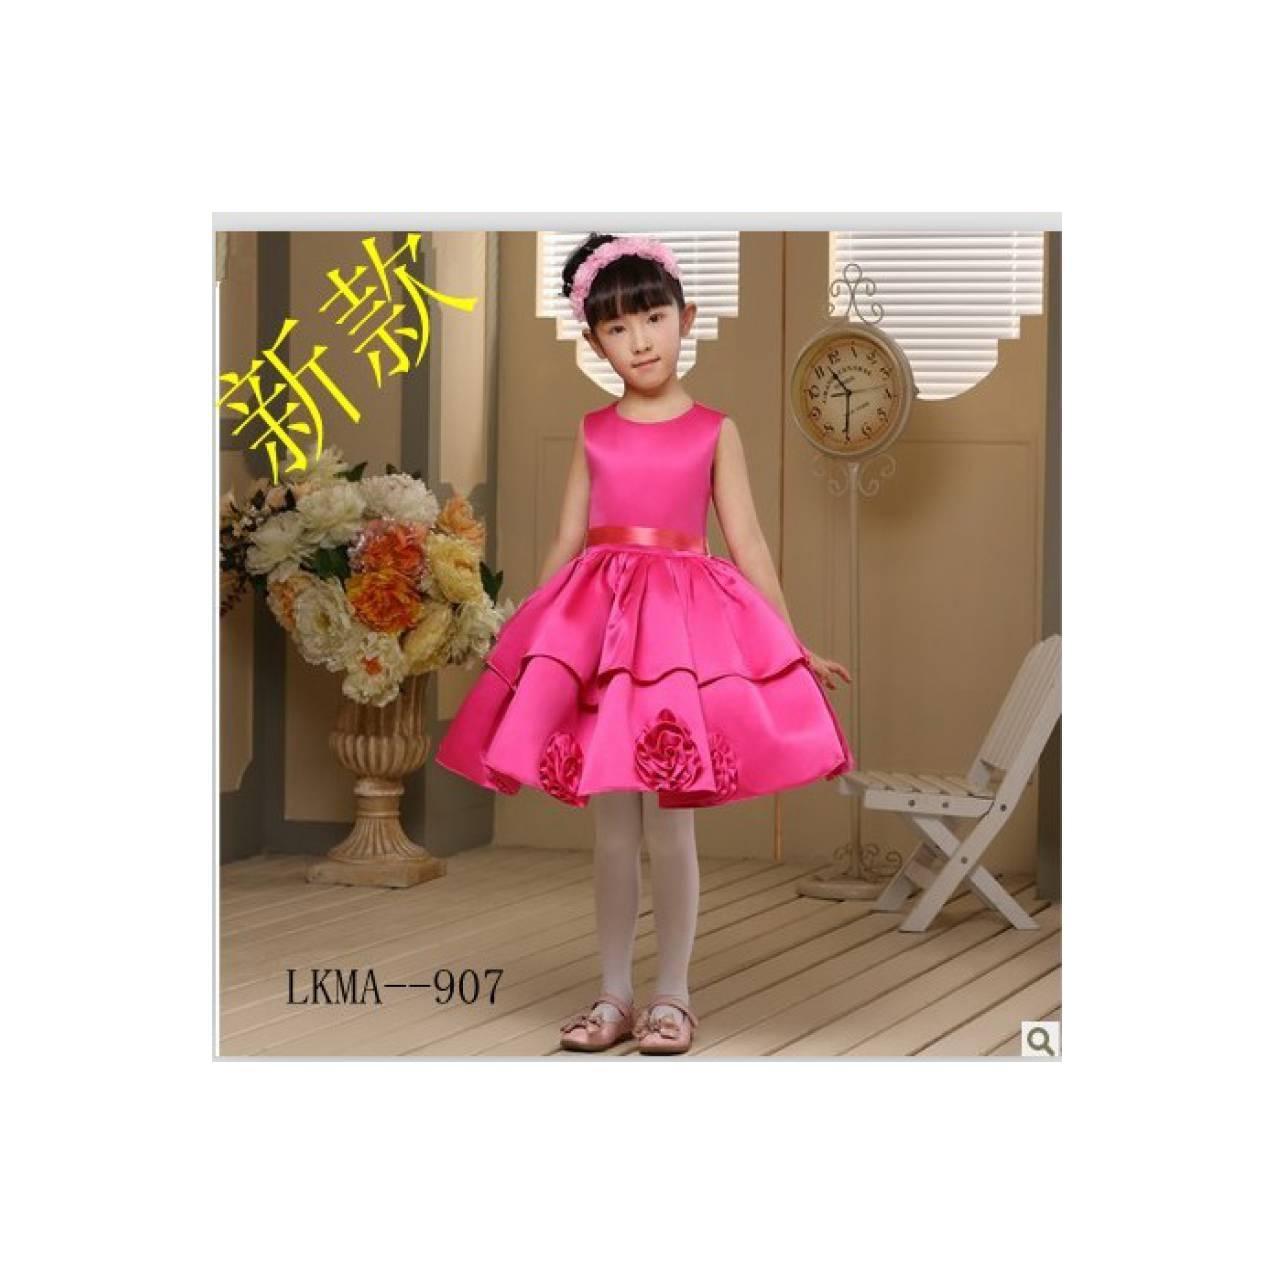 Gaun pesta anak model simple mini dress warna rosy pink /baju princess